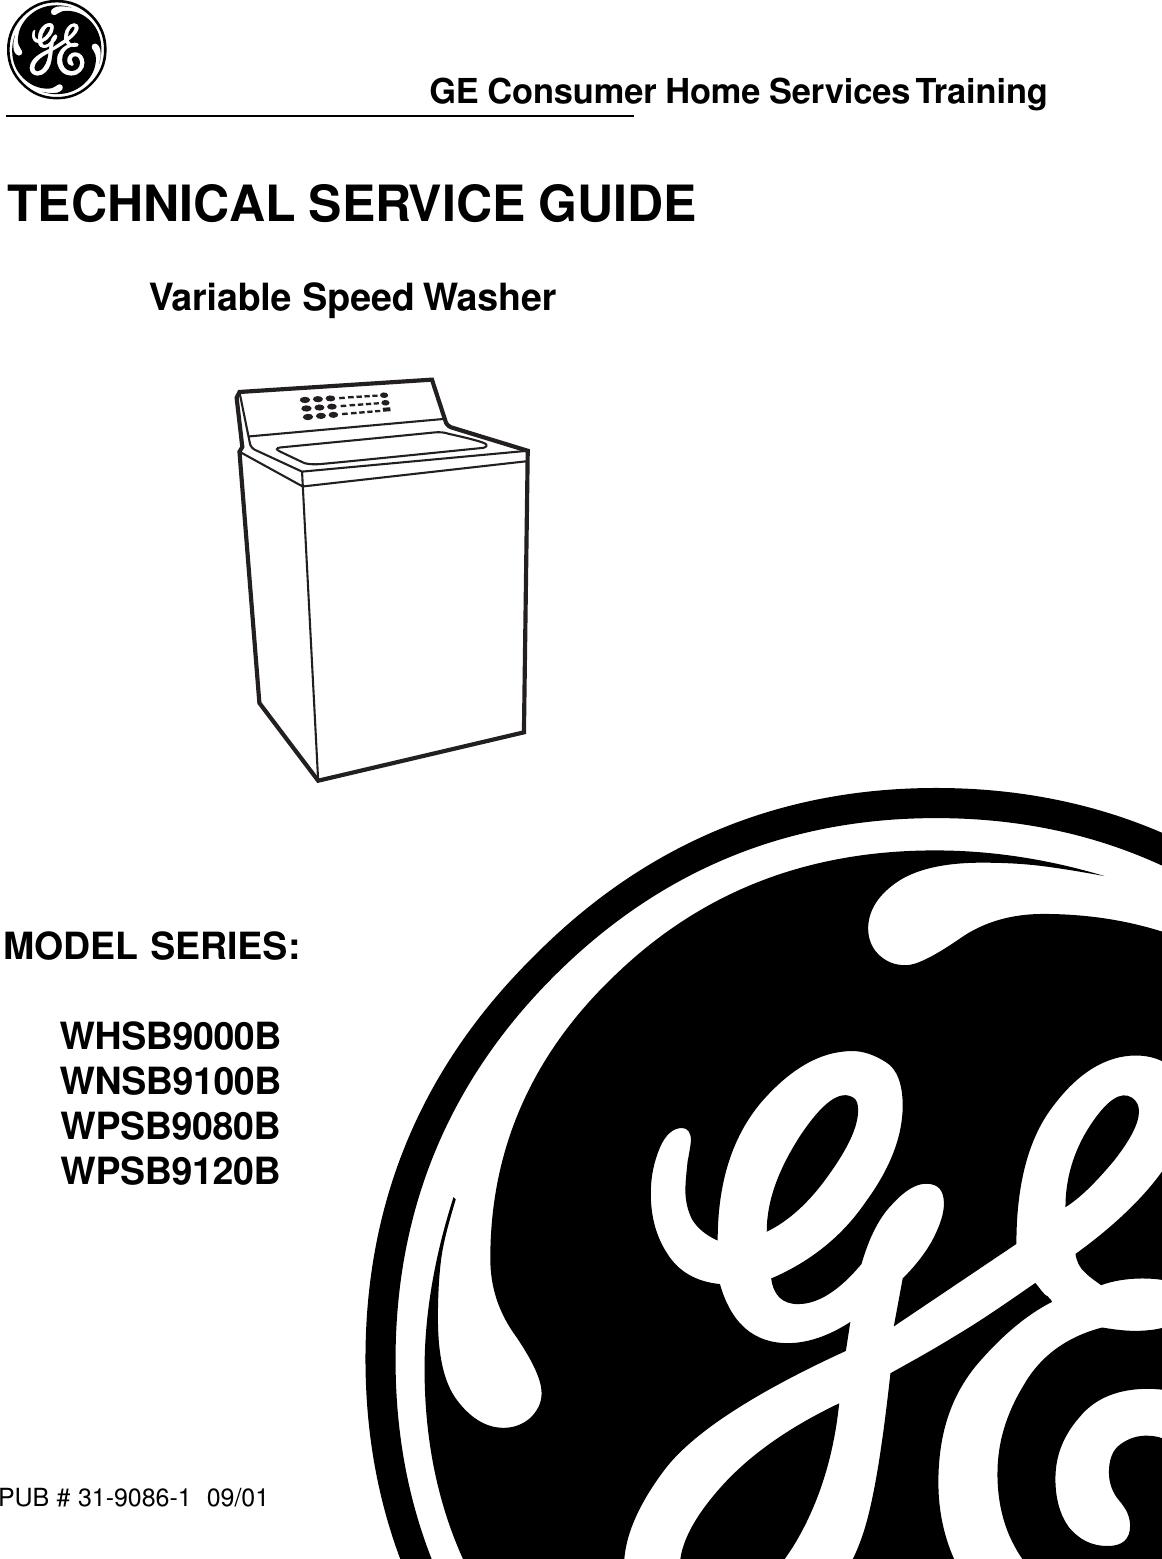 2 GE Top Load Washer WPSB9120 31 9086